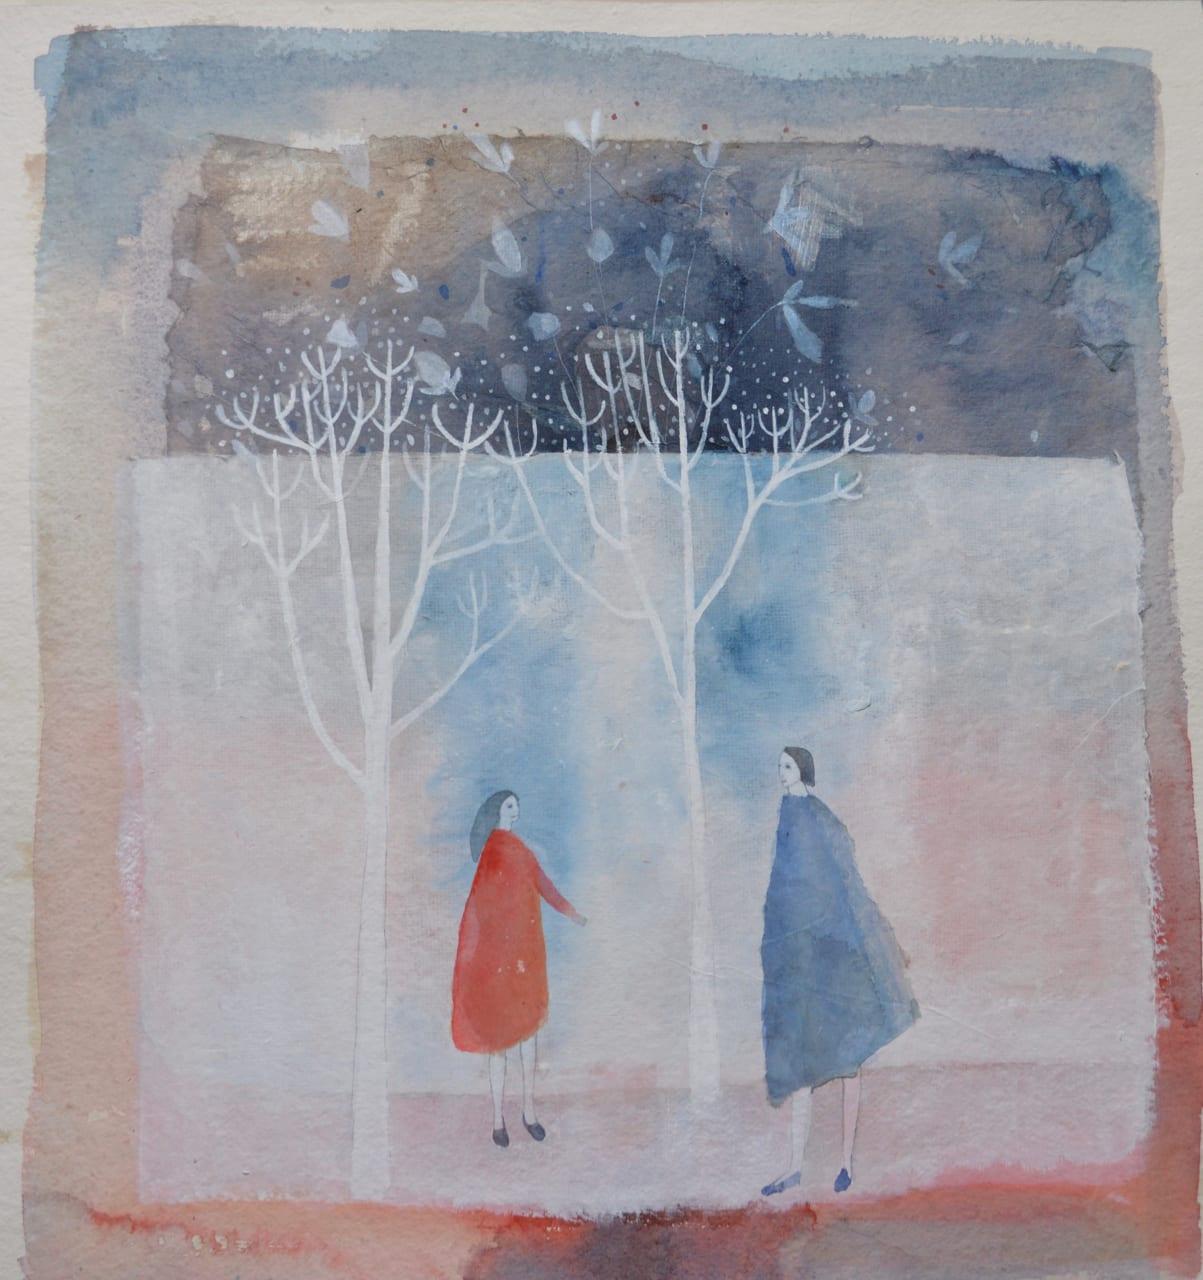 Julie Collins, A CHARM OF FRIENDS